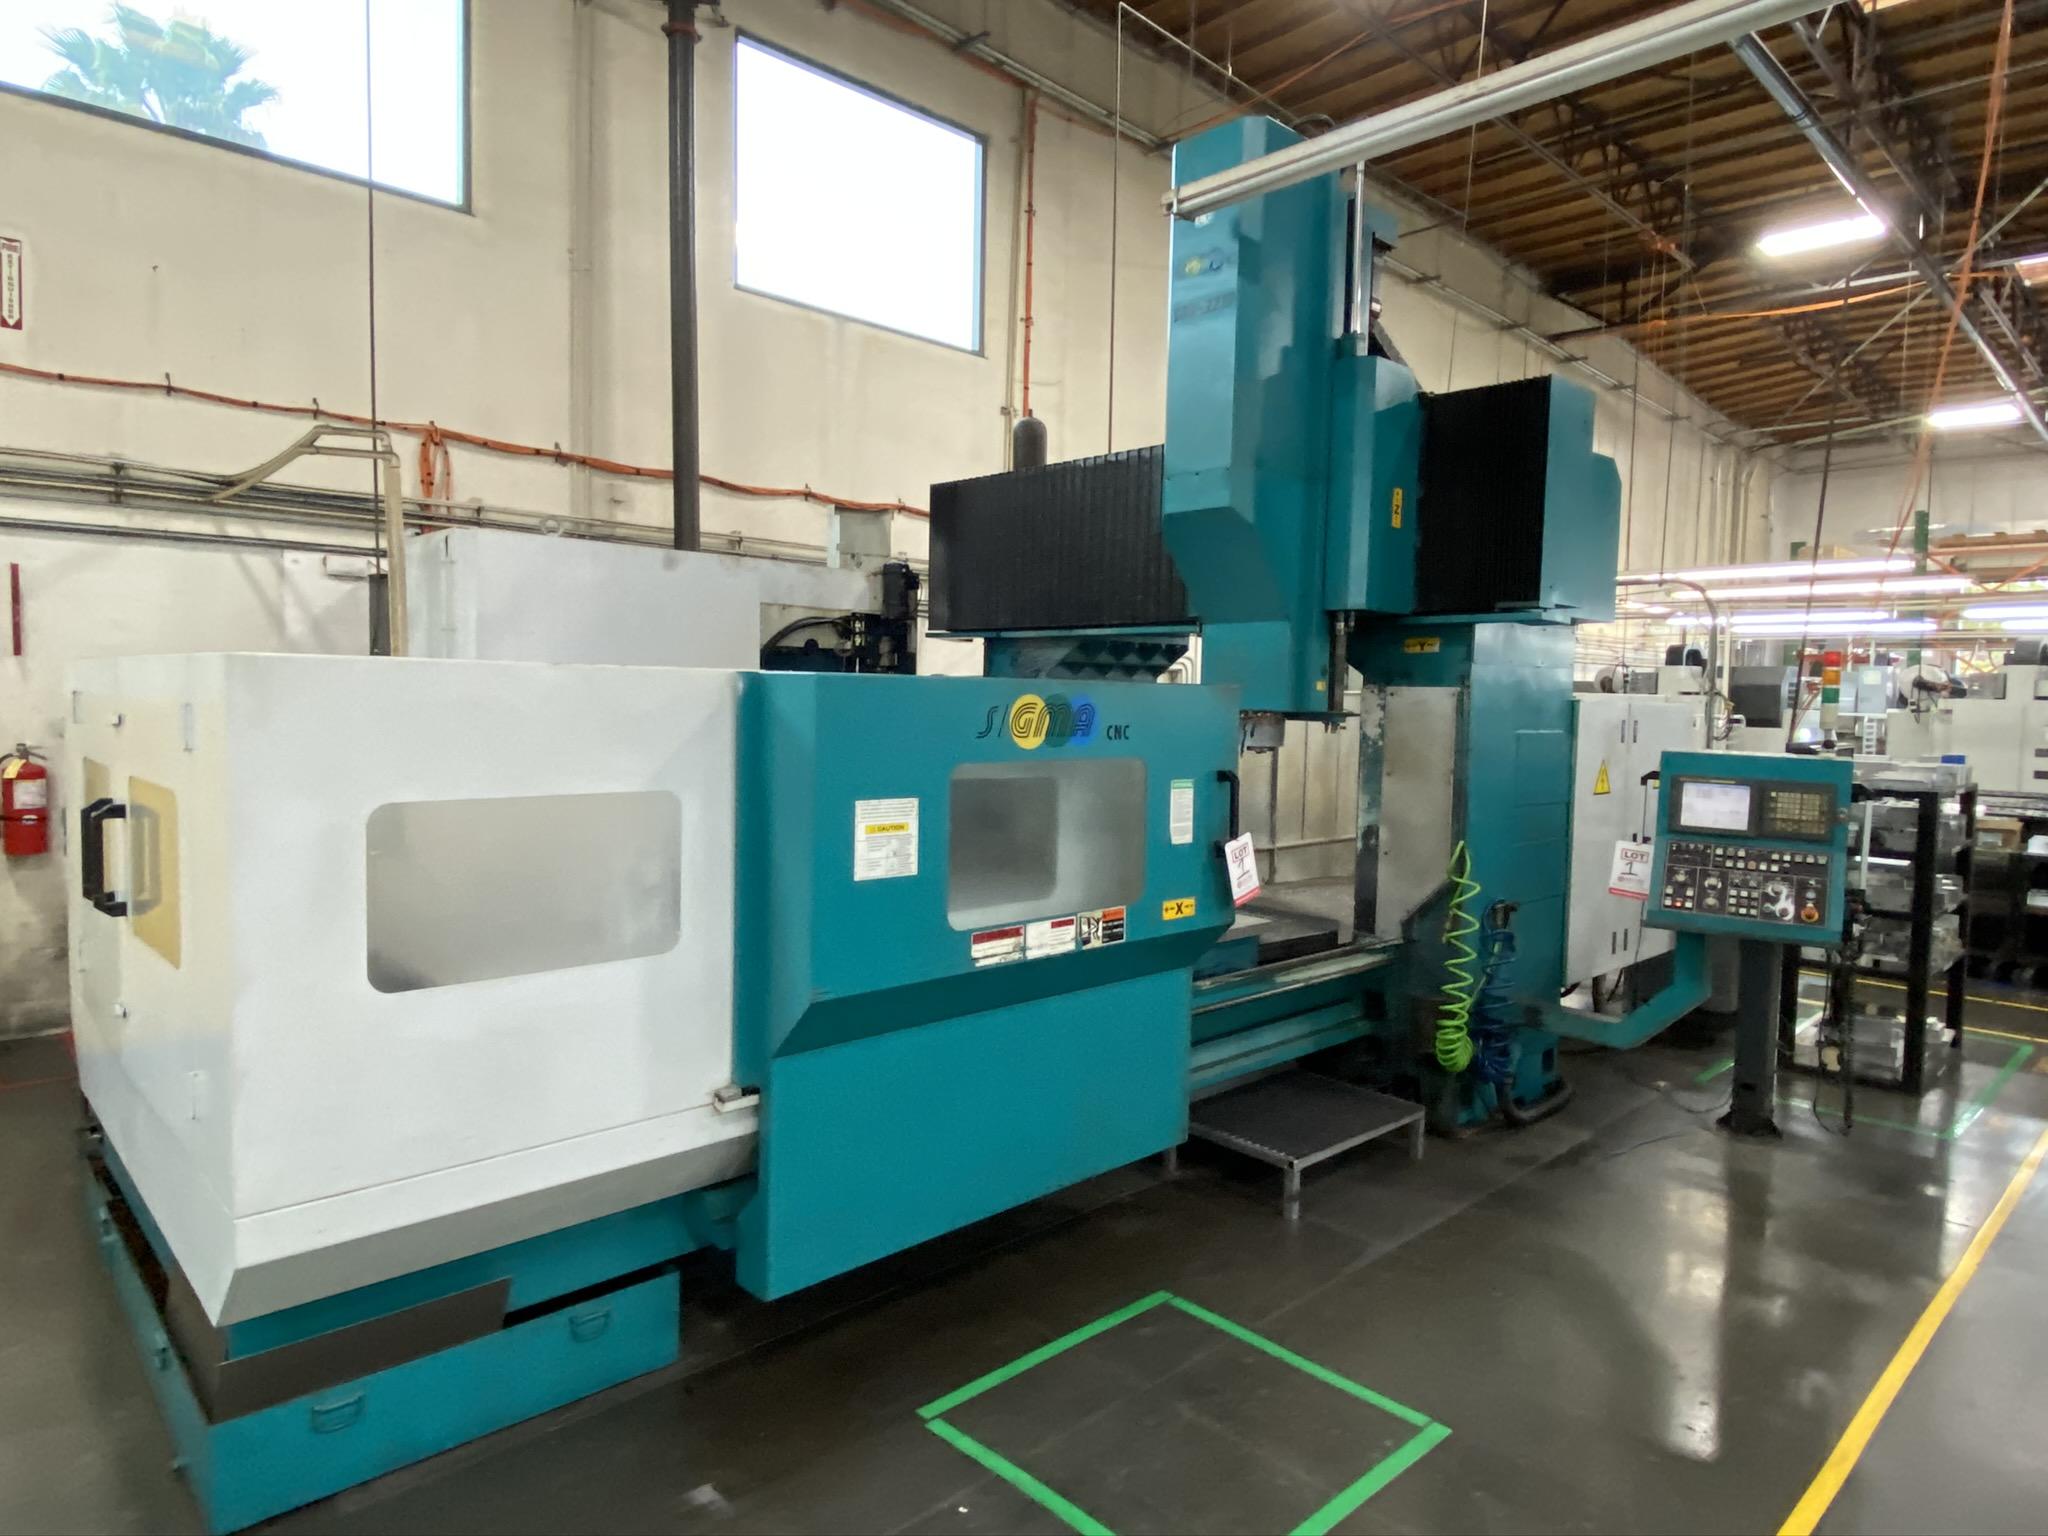 2005 SIGMA CNC DOUBLE COLUMN MACHINING CENTER, MODEL SDV-3219, FANUC 18IMB CNC CONTROL